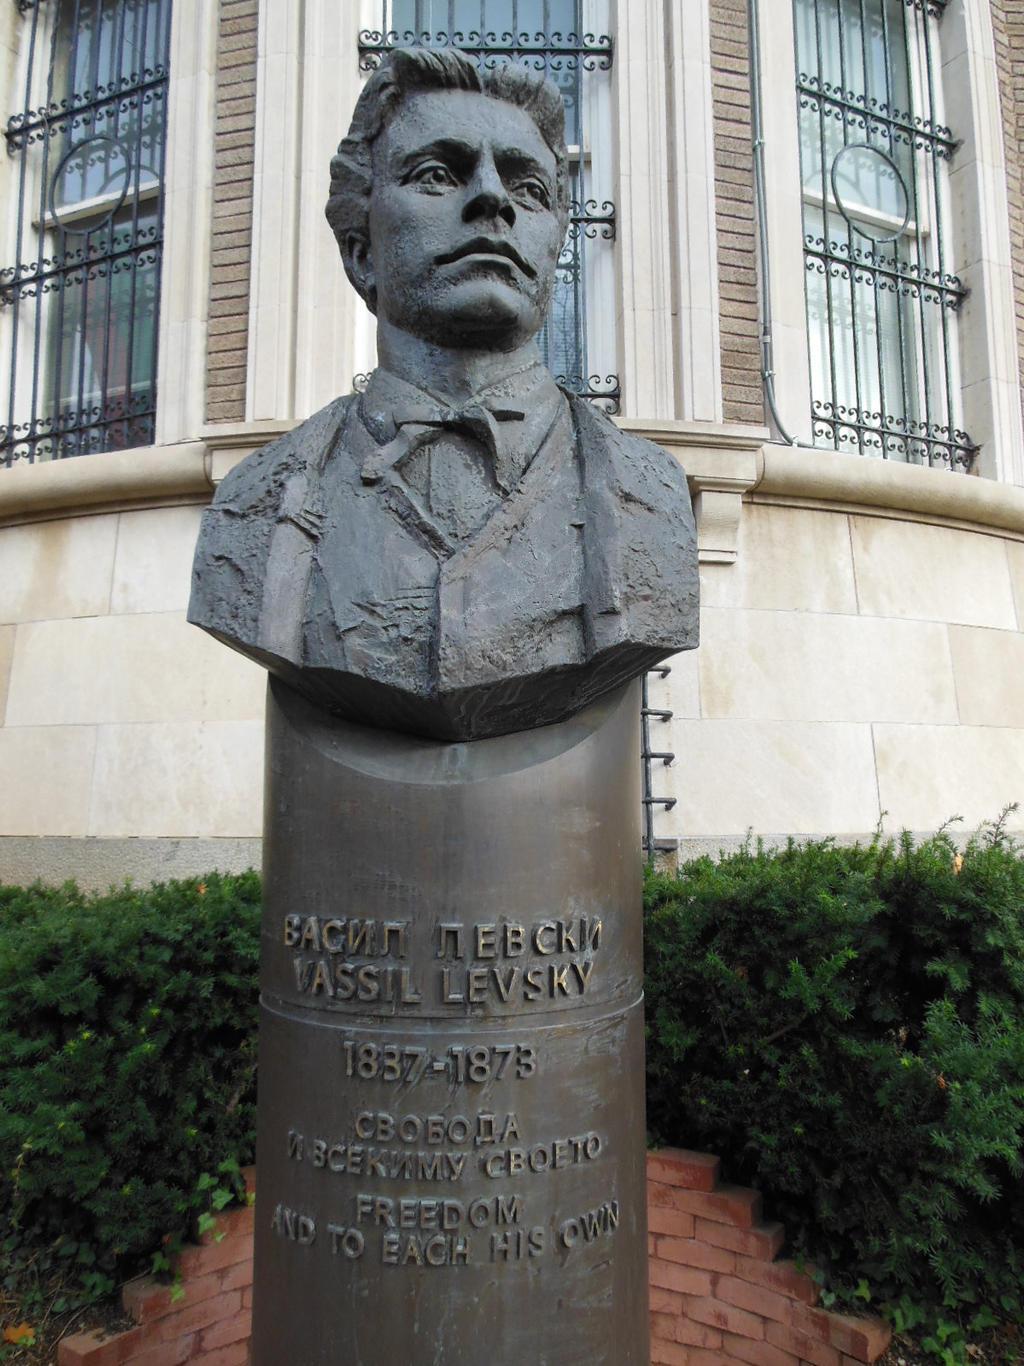 Vasil Levski Statue in Washington